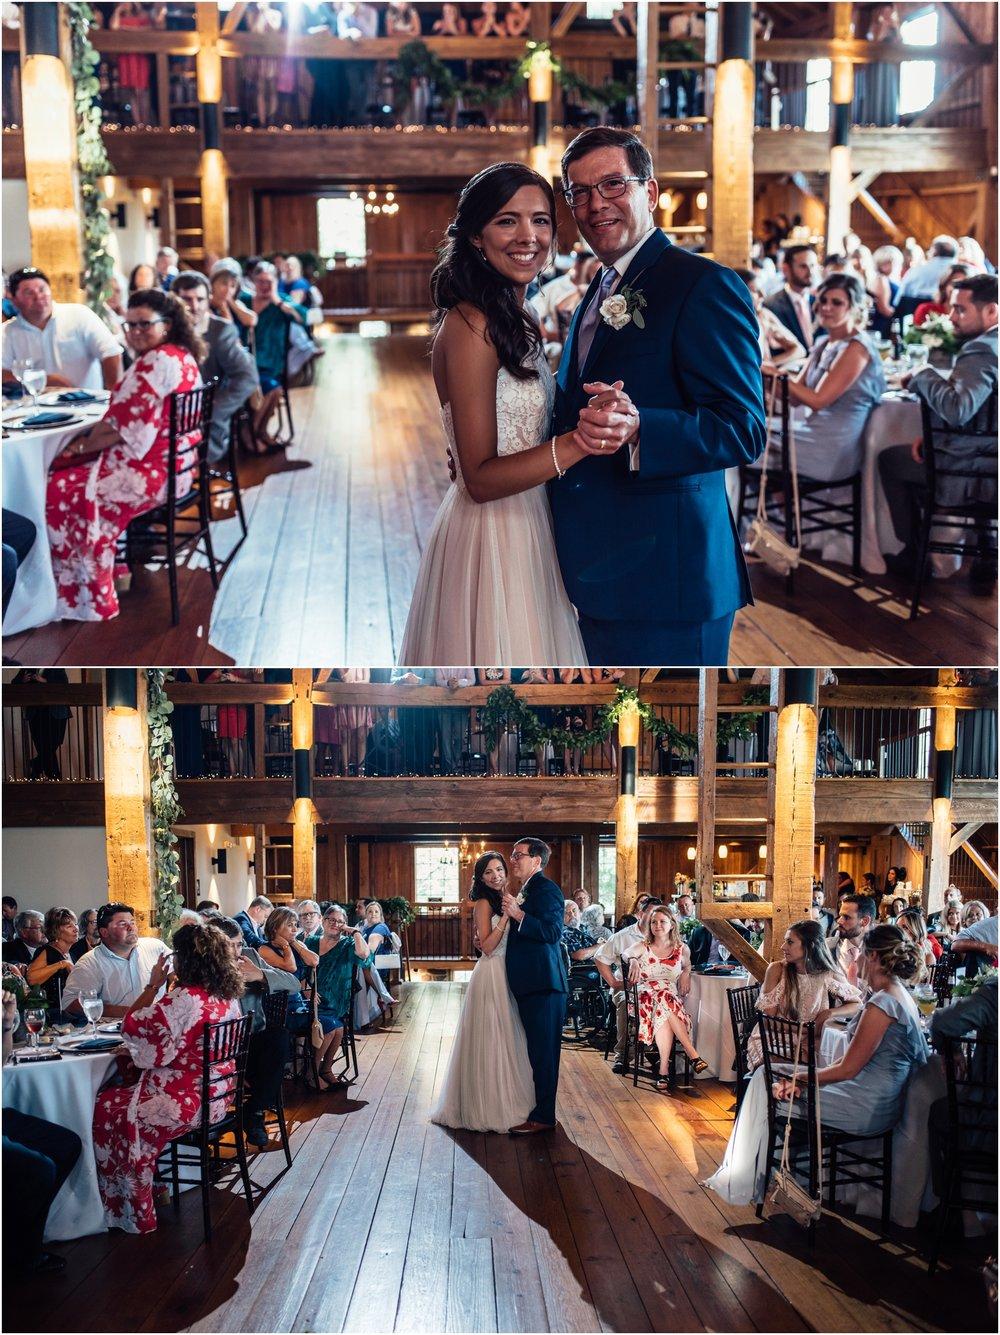 Steph&Bryan_Lancaster_wedding_farm_0541.jpg